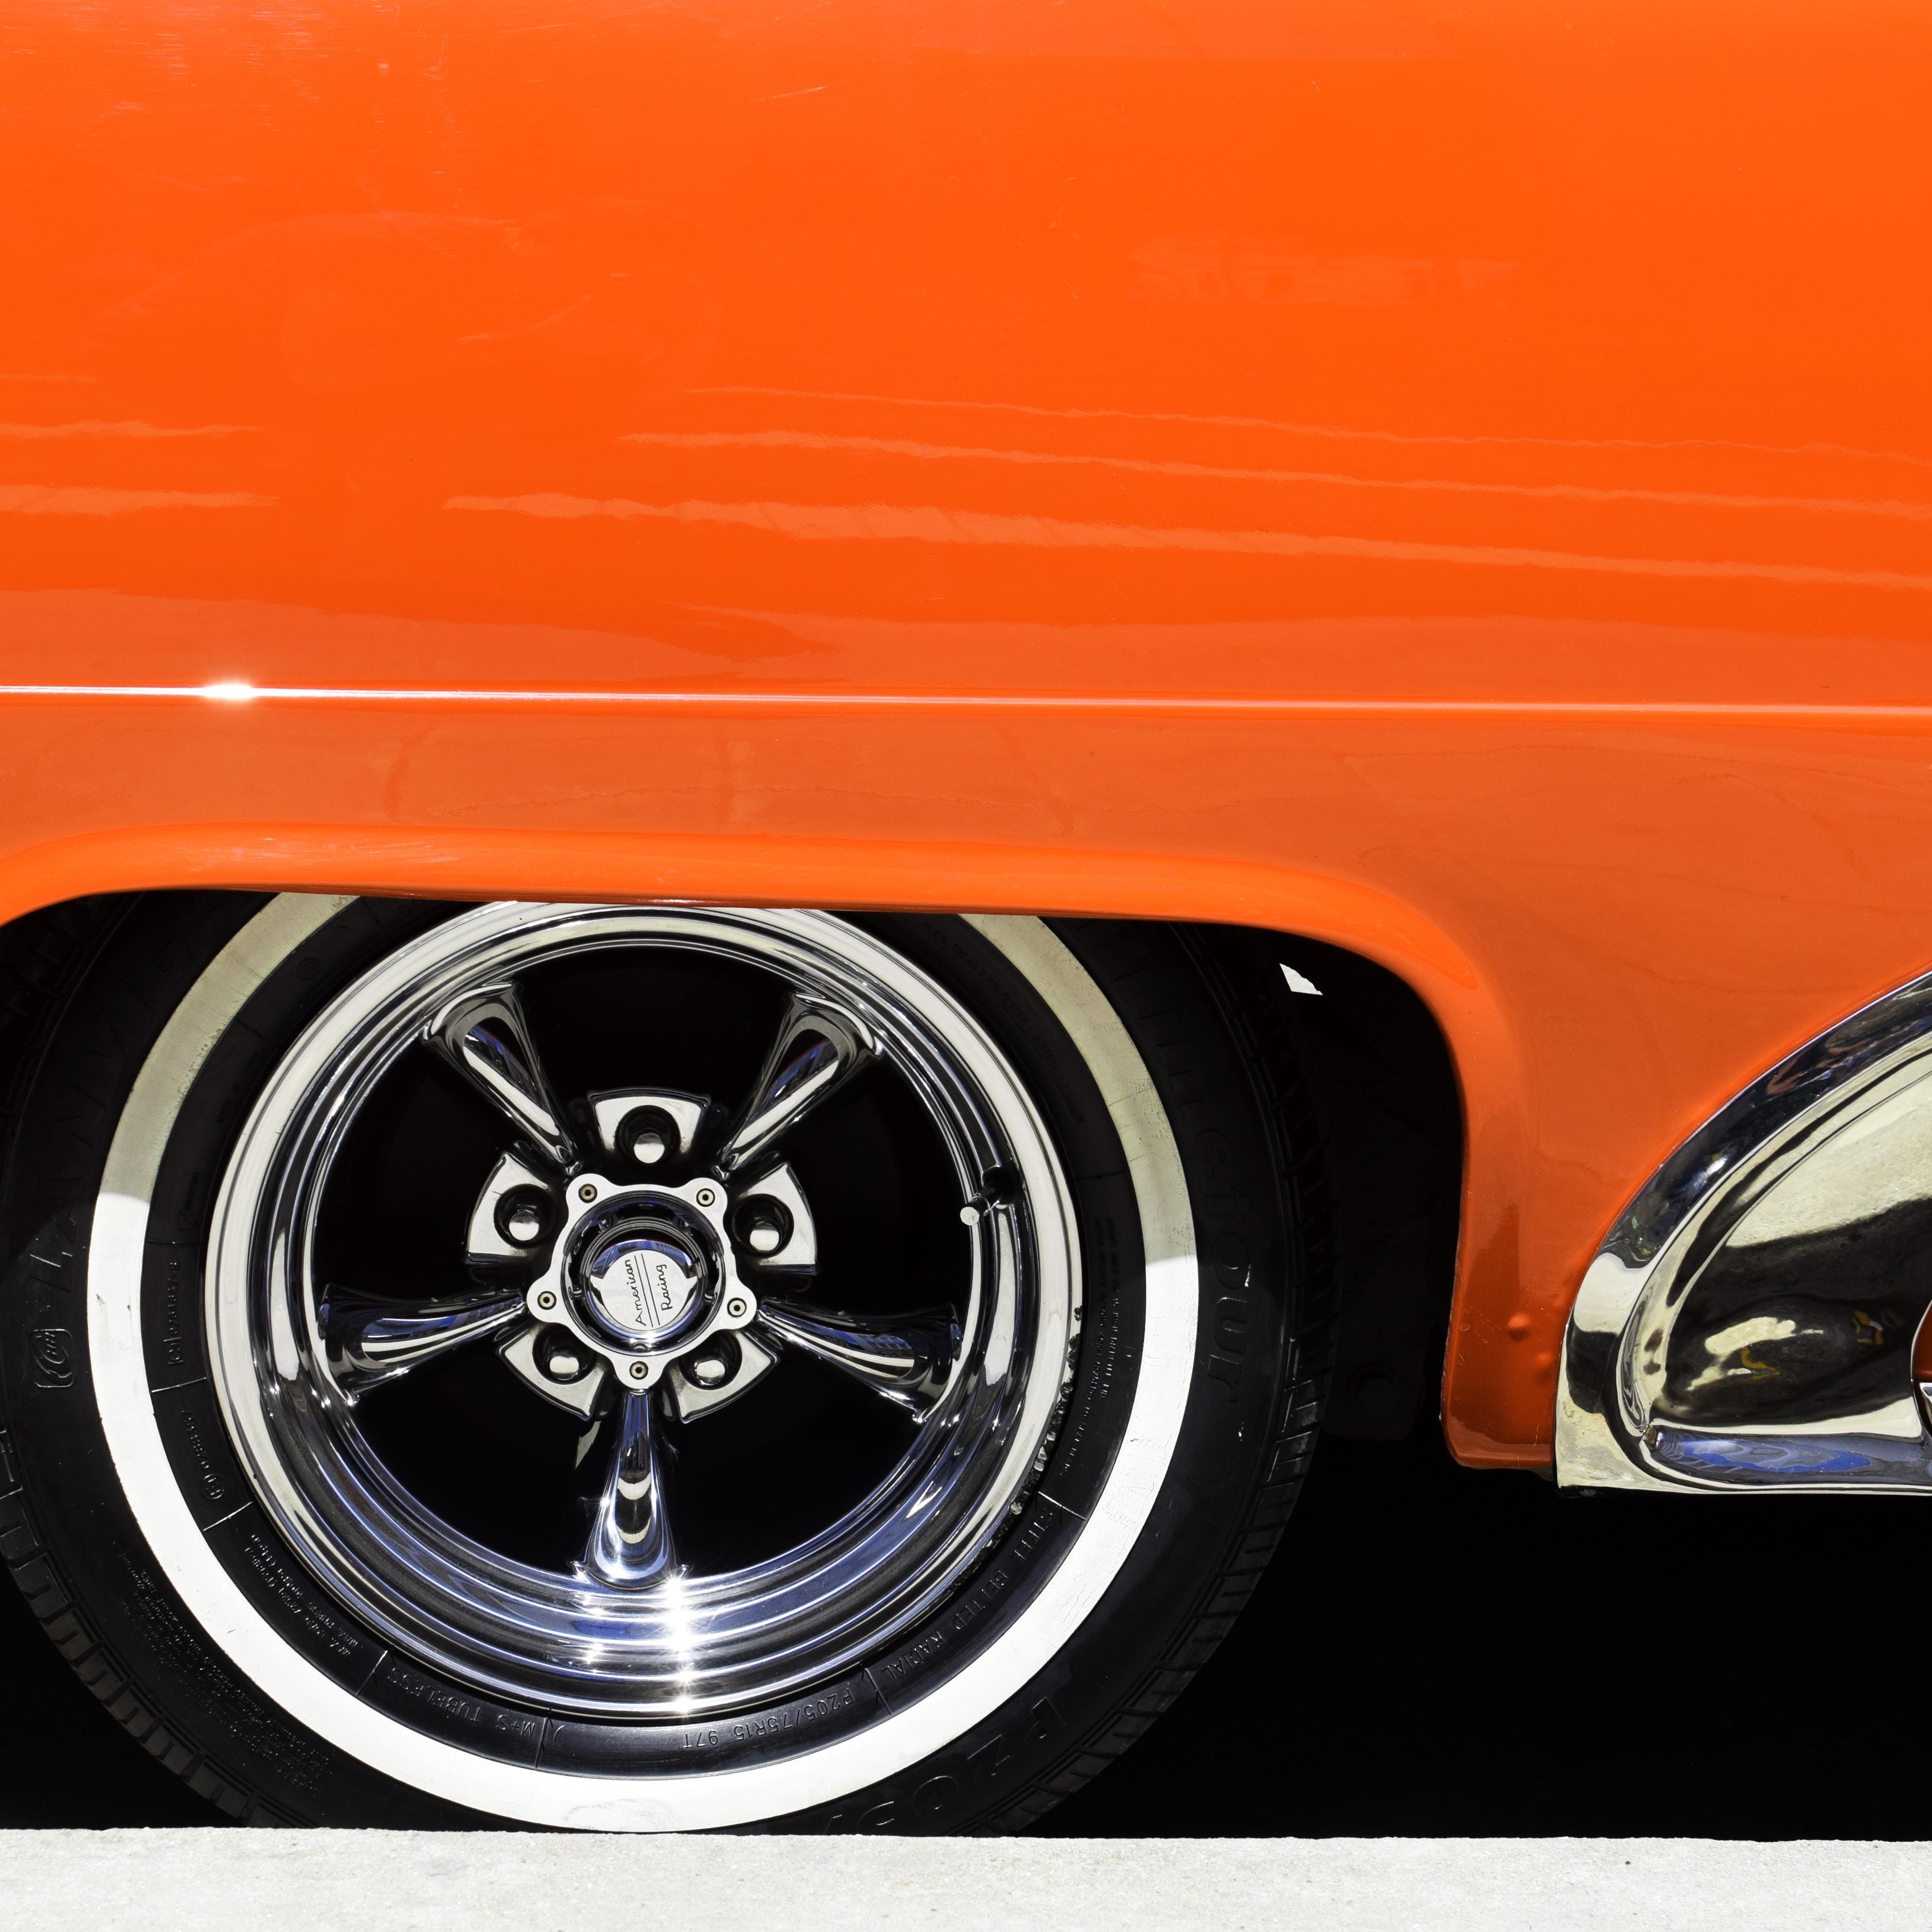 A classic tire on an orange sports car in Havana